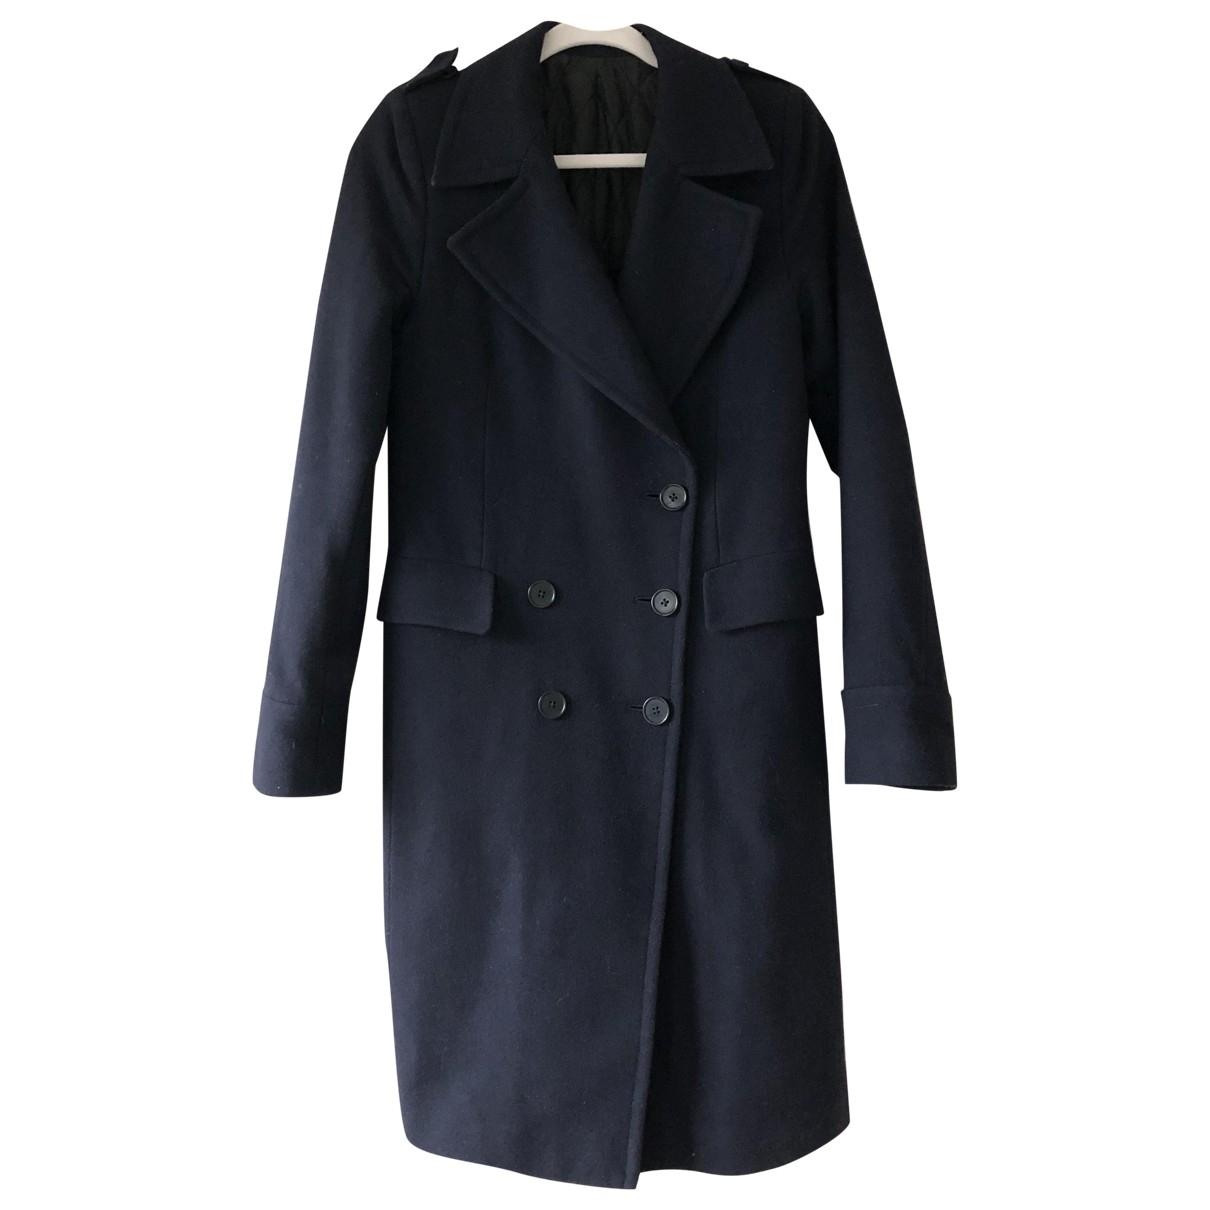 Blk Dnm \N Navy Wool coat for Women XS International